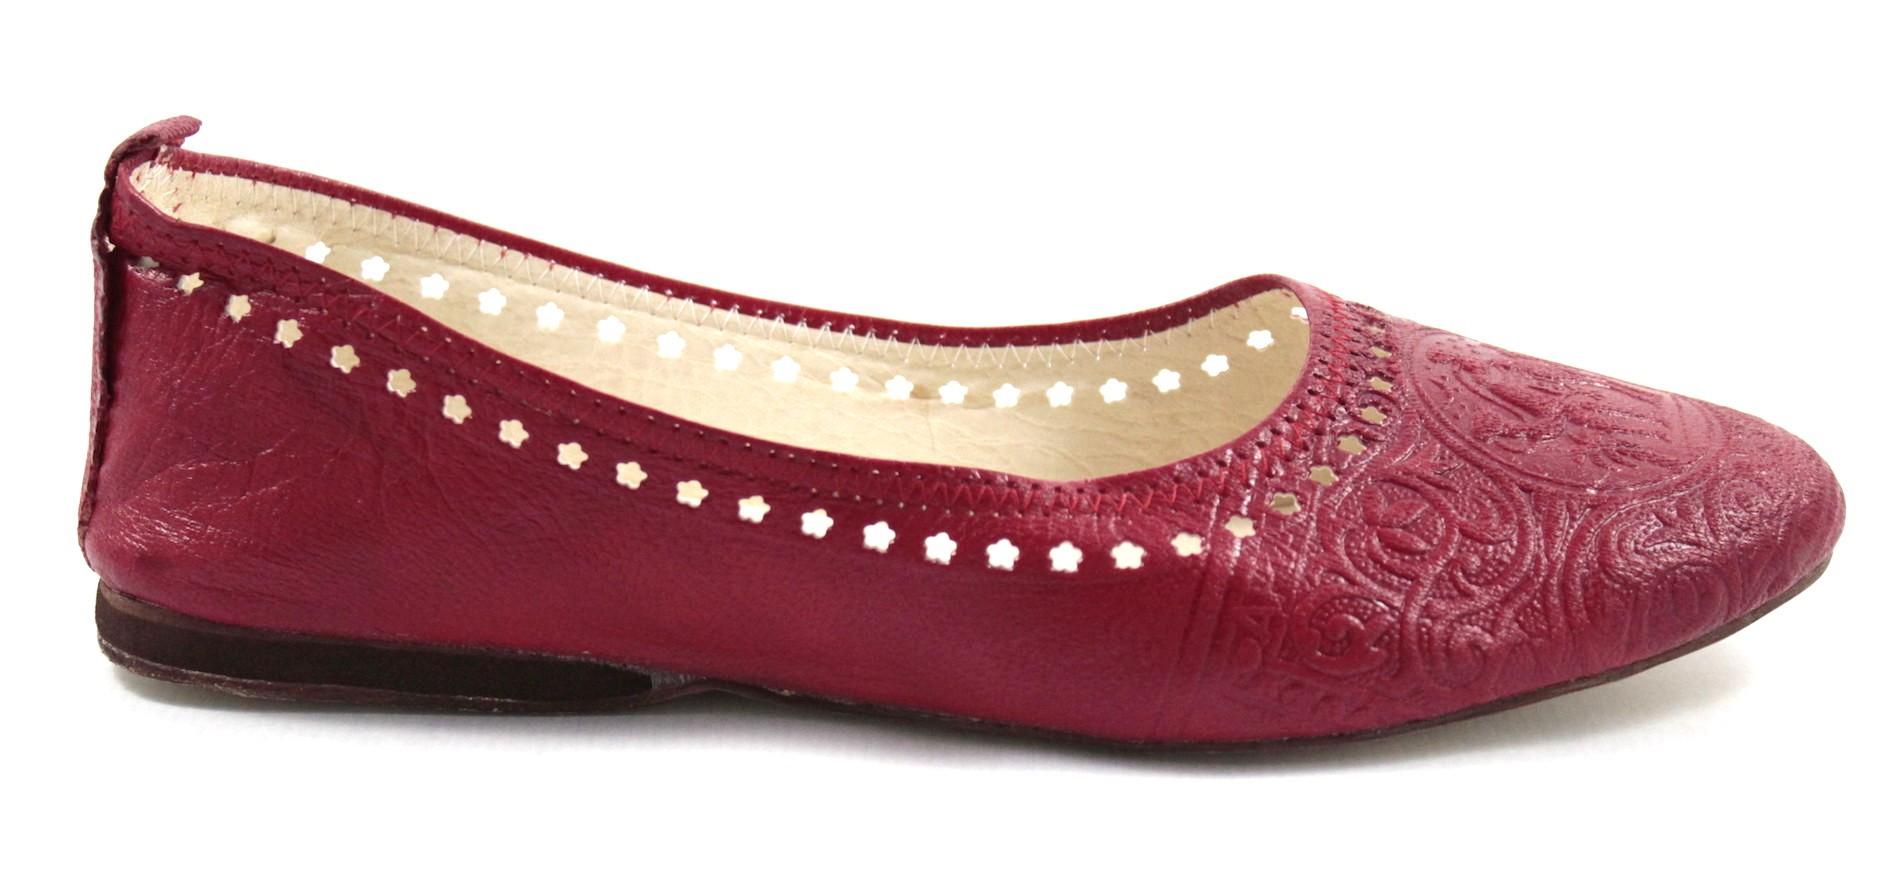 23b8a0402 Ghita ballerina in red leather